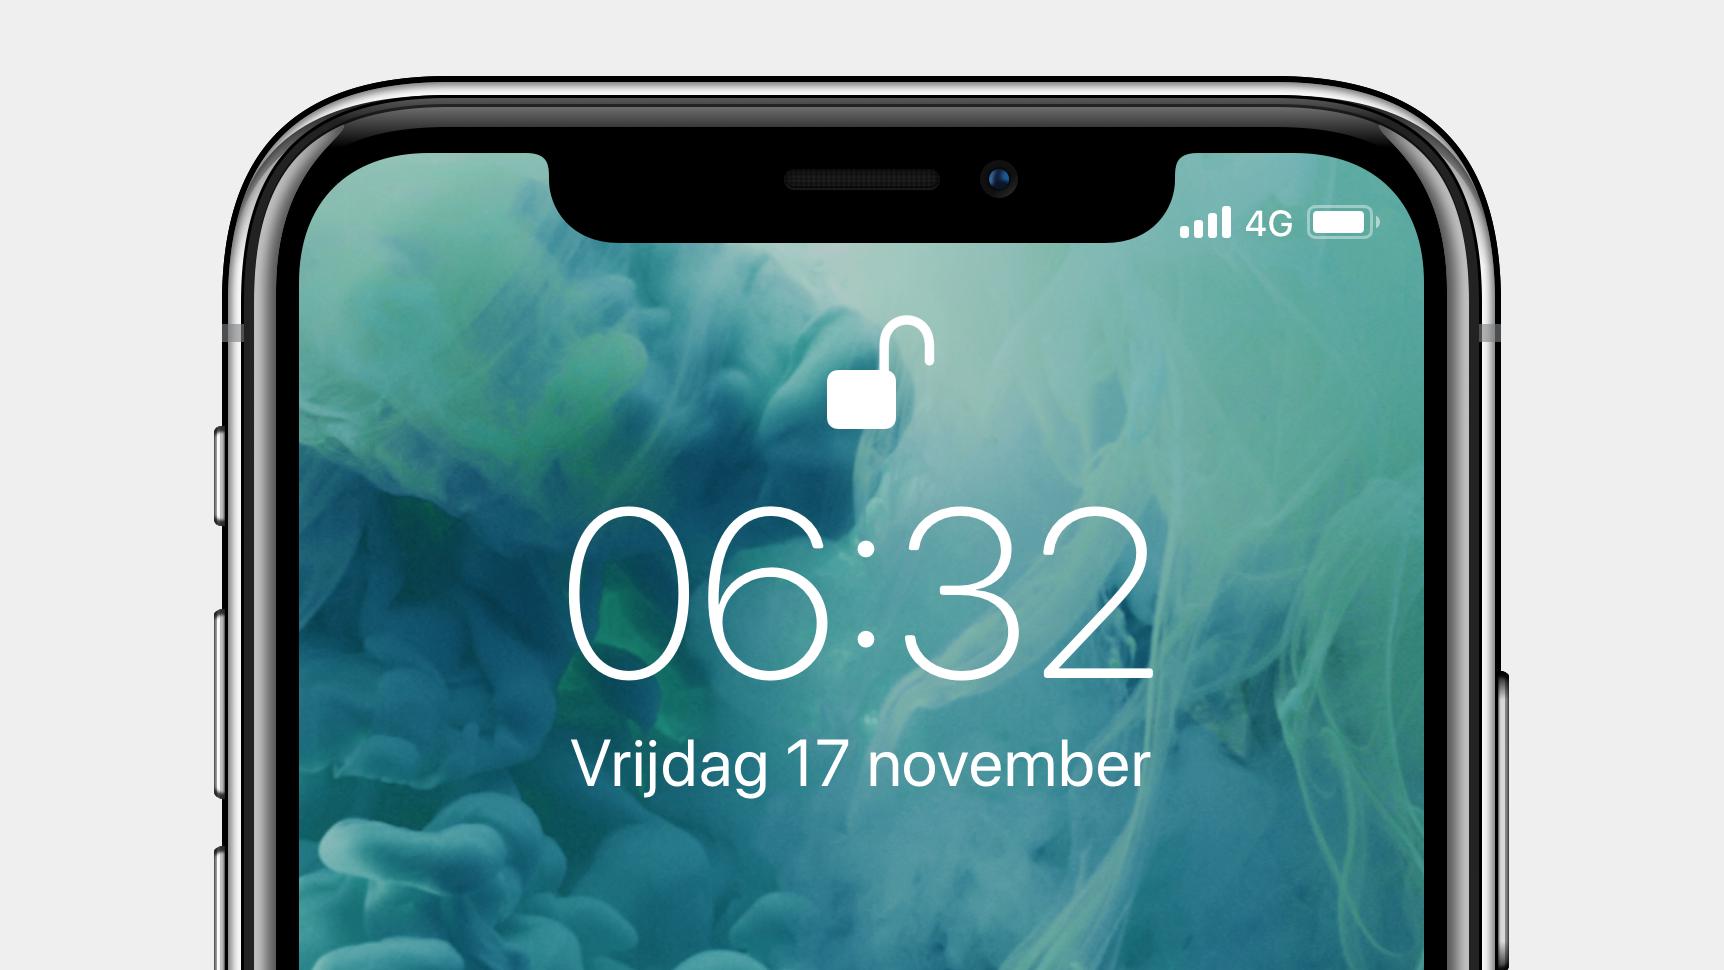 iPhone X winter 16x9